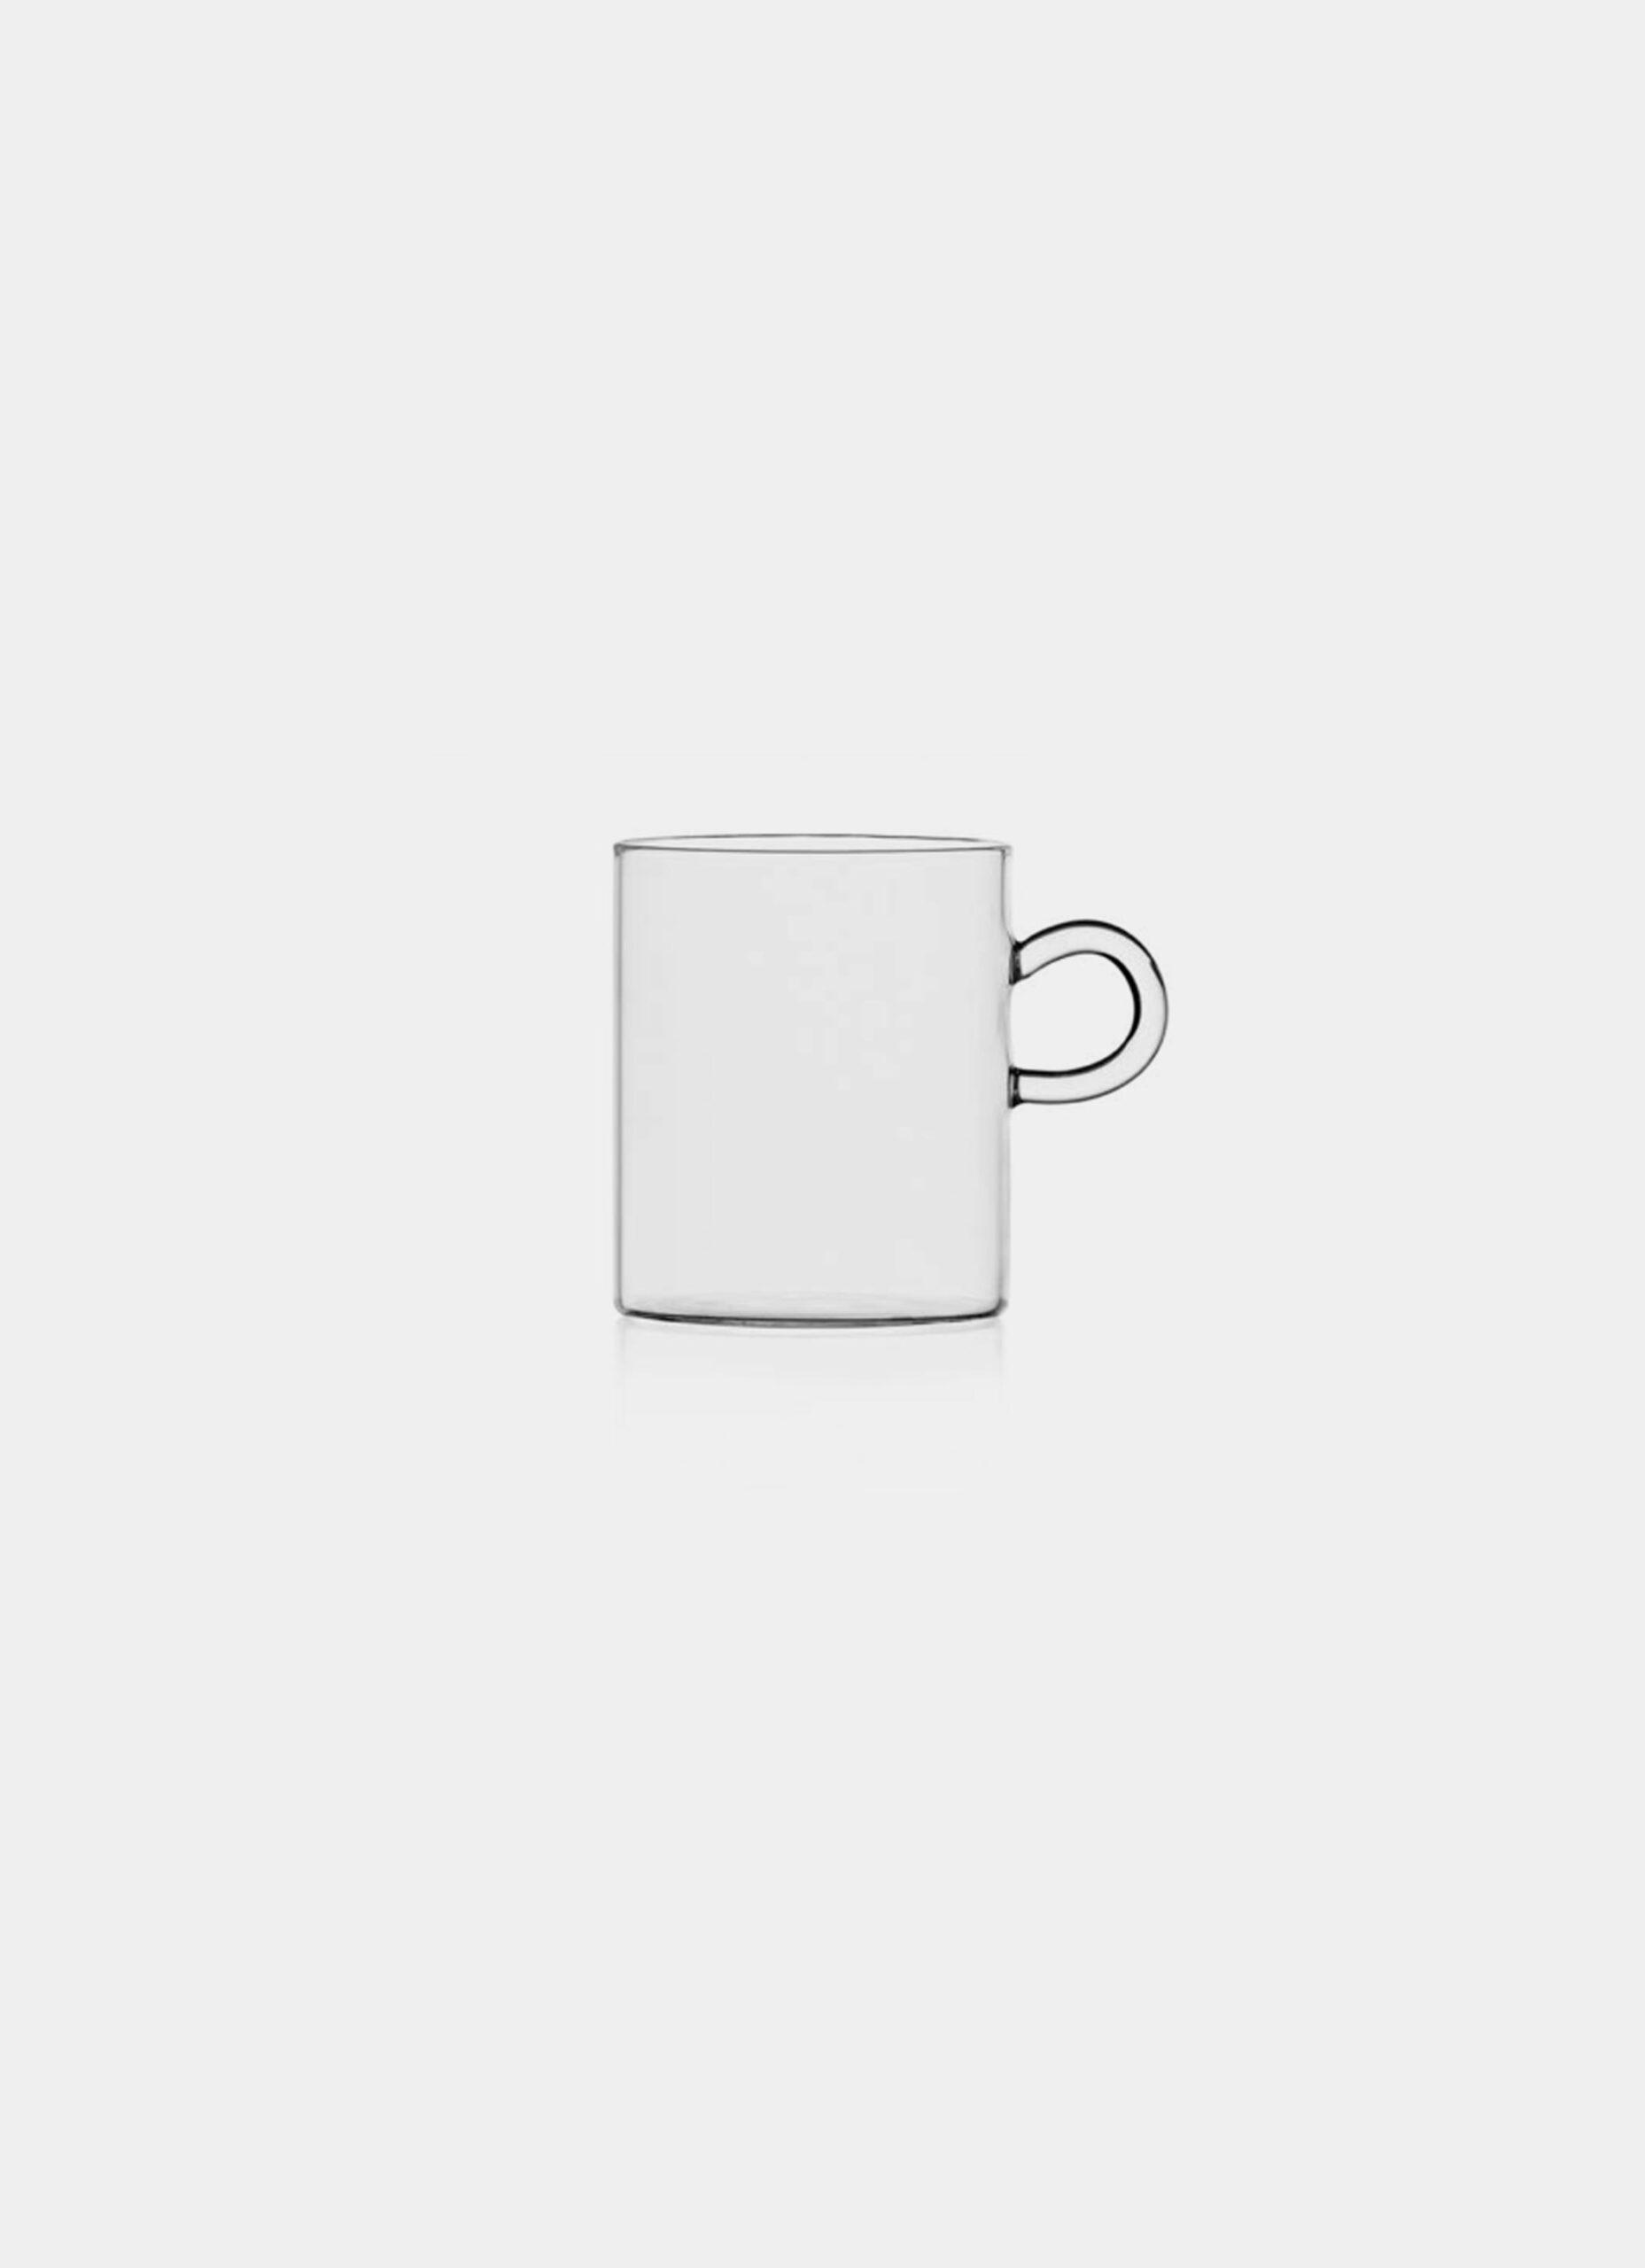 Ichendorf Milano - Marco Sironi - Piuma - Tea Mug